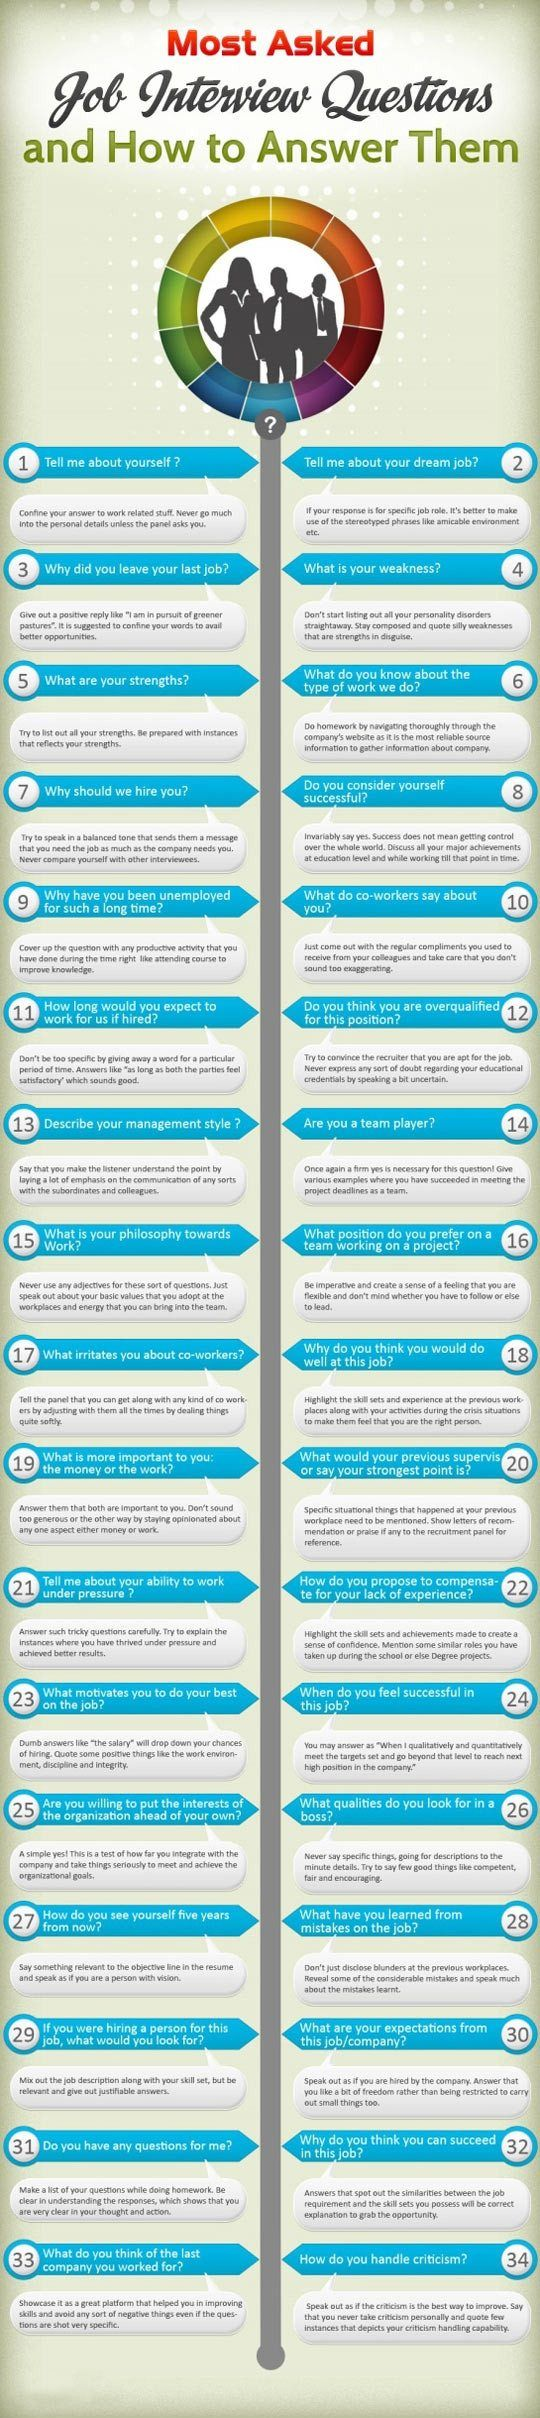 most asked job interview questions. | Job interviews, Job info and ...